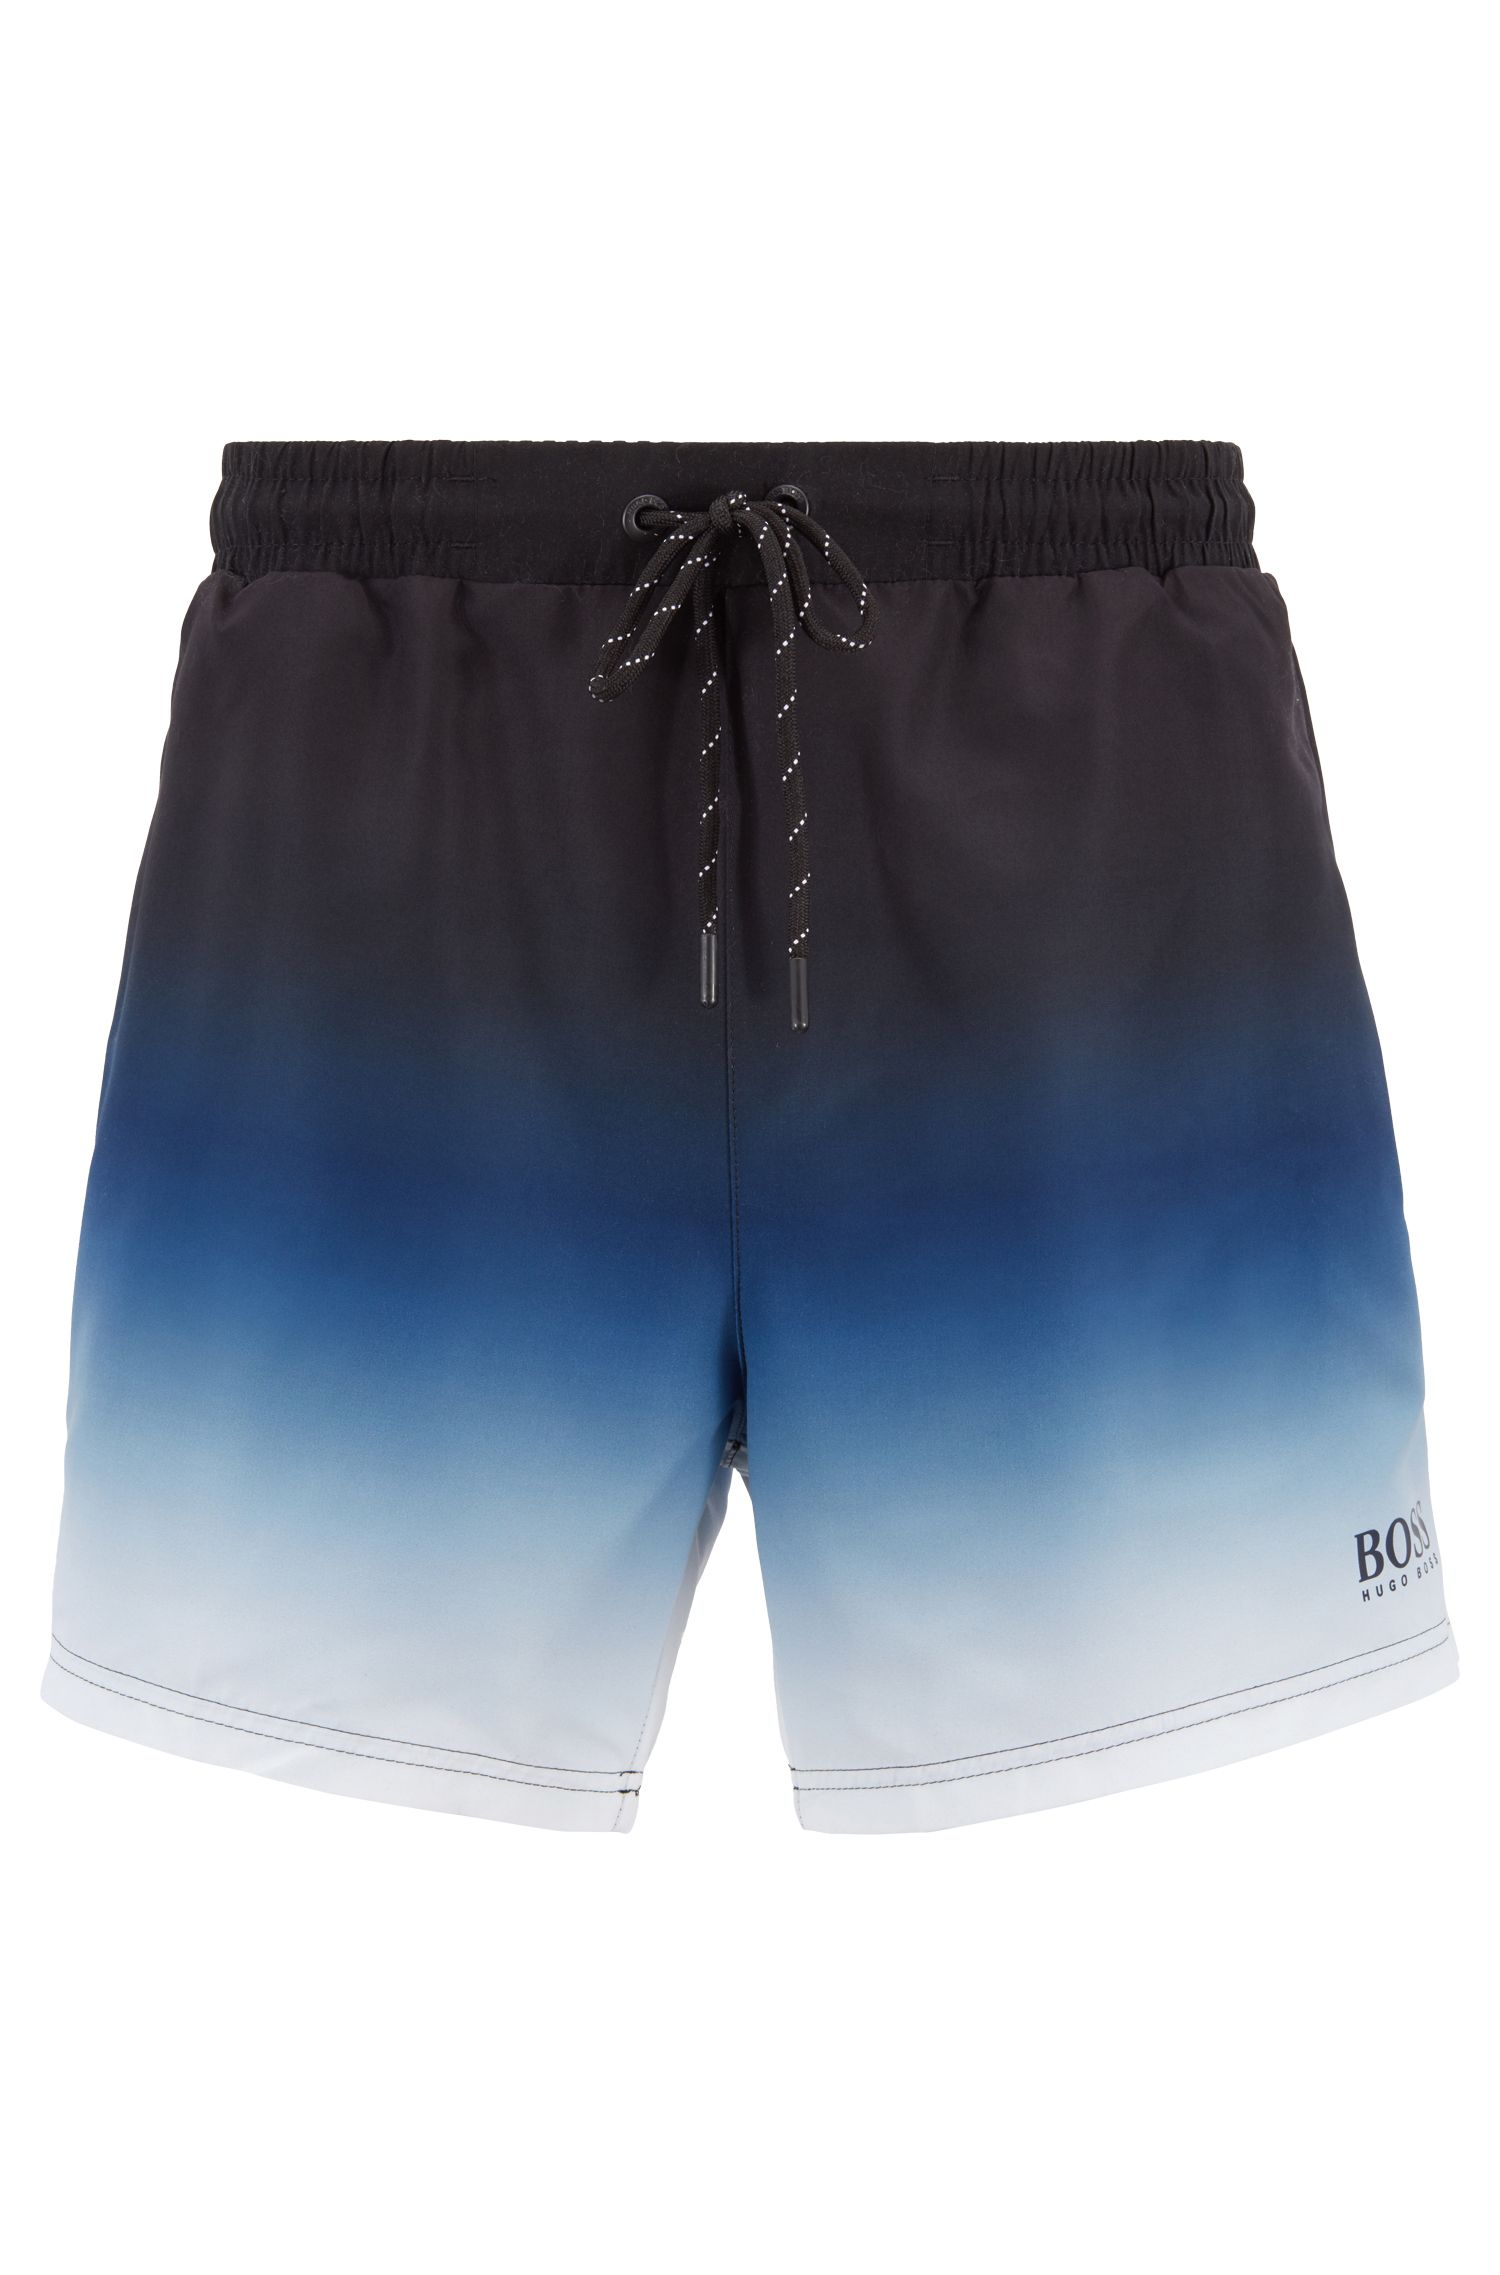 Sneldrogende zwemshort met digitale print, Blauw